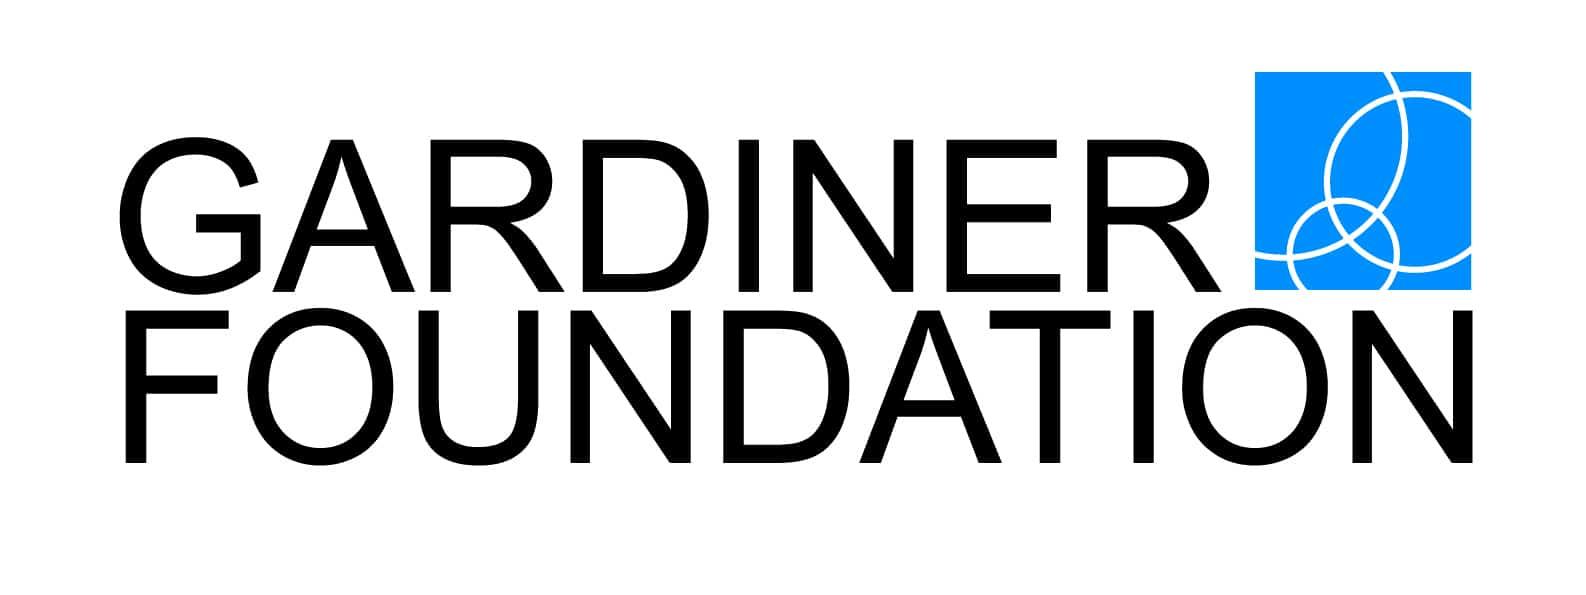 Gardiner Foundation